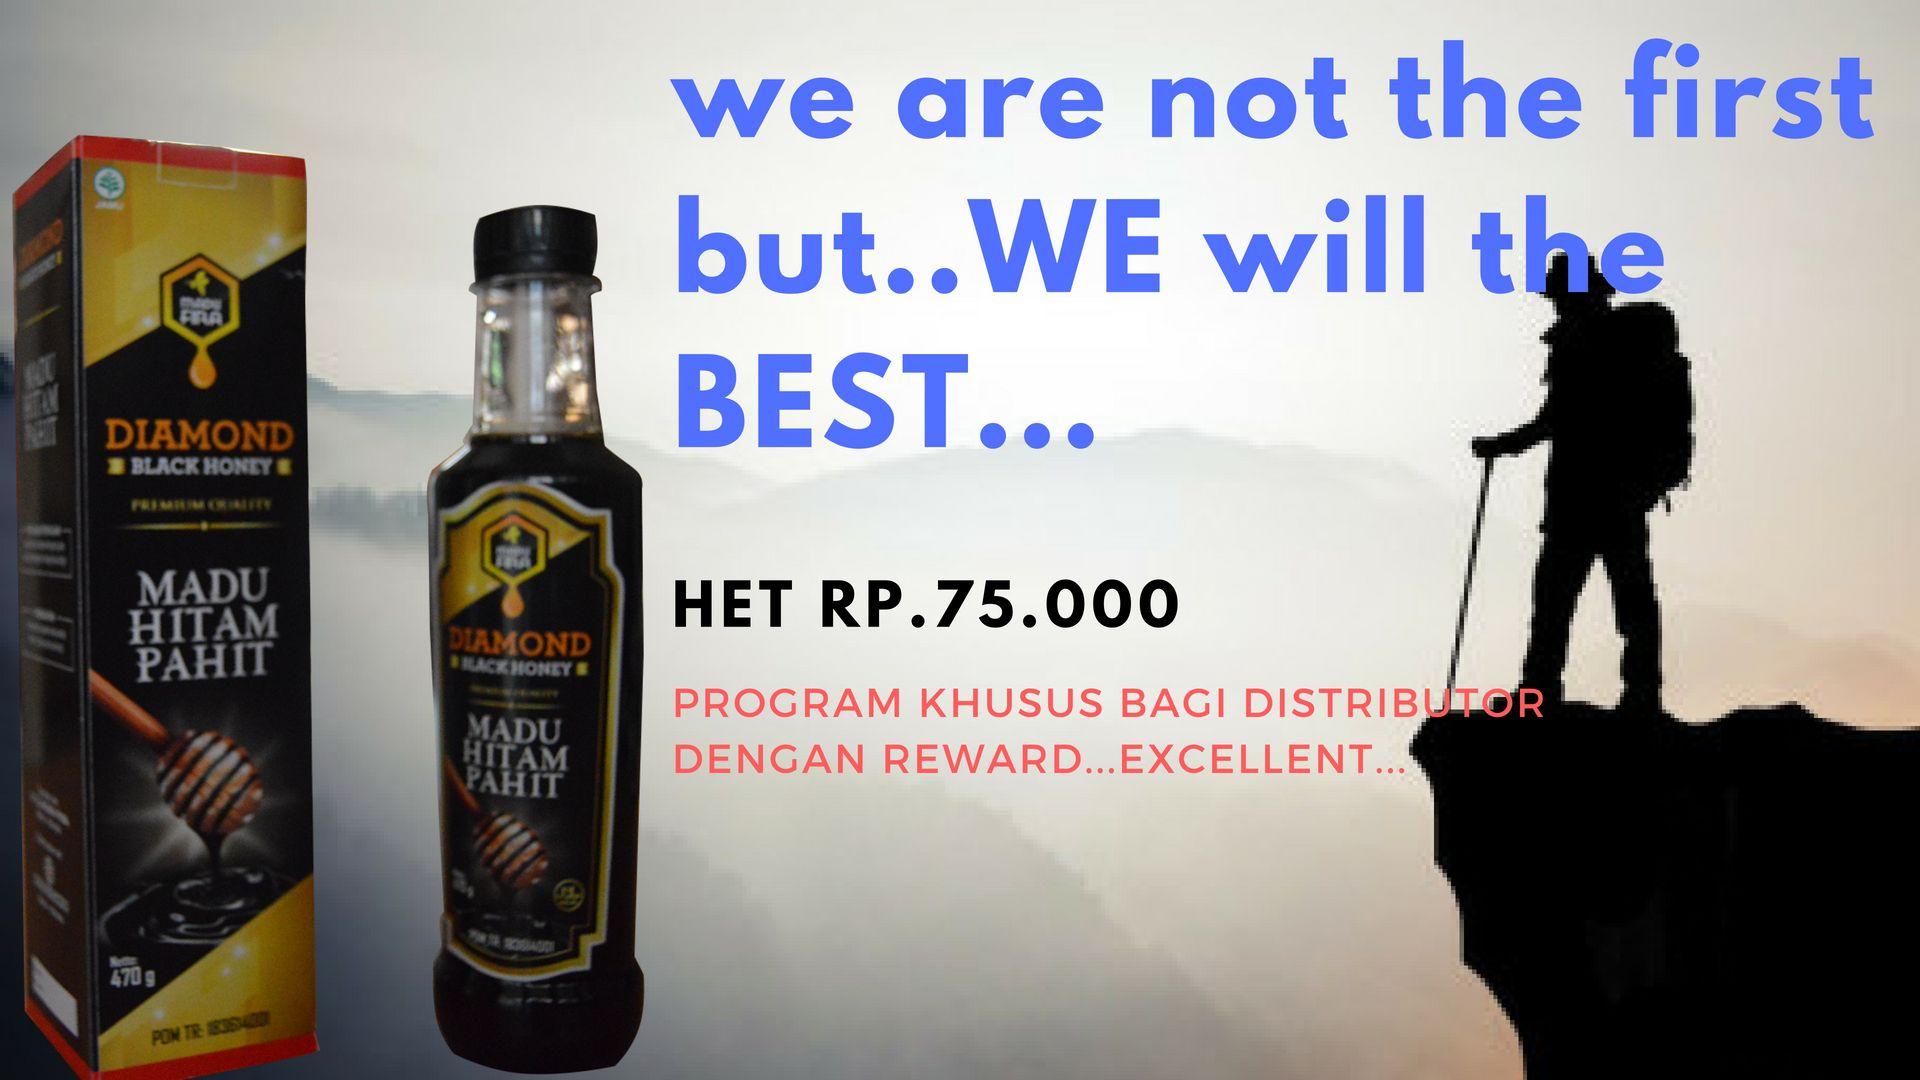 081383465701 Diamond Black Honey Adalah Madu Hitam Pahit Dari Az Zikra Original Agen Propolis